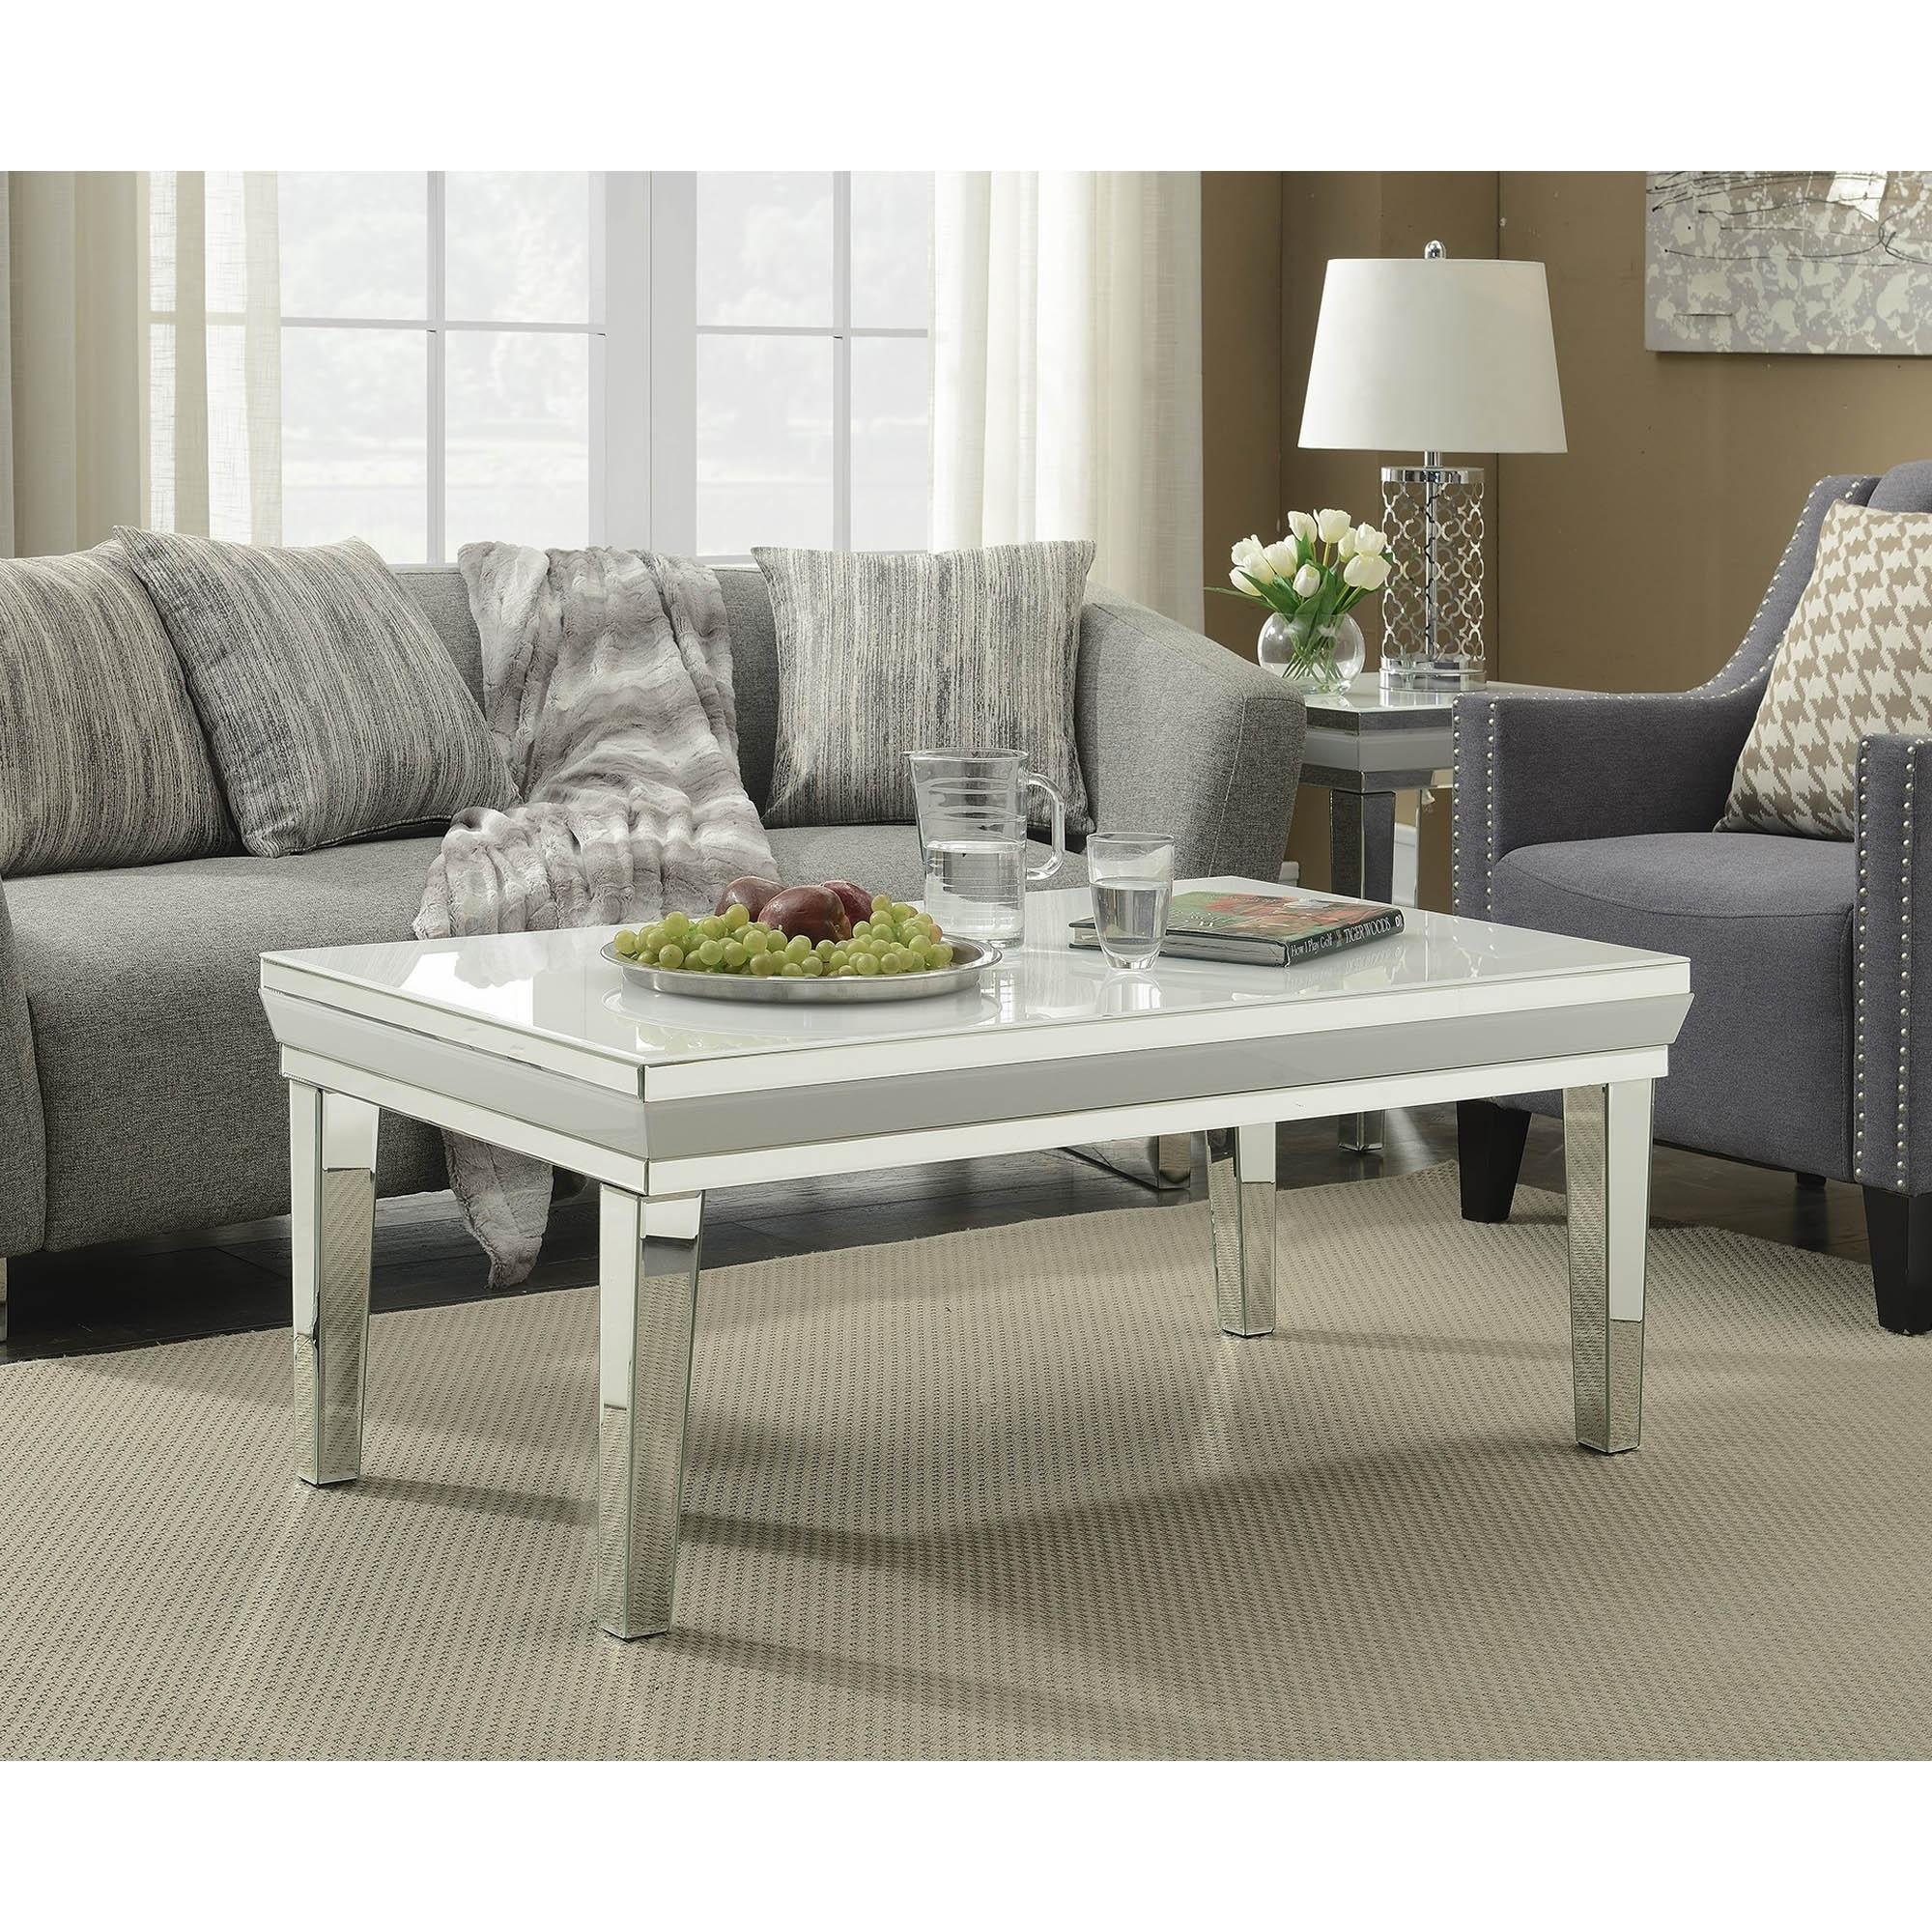 Astounding Malibu Mirrored Coffee Table Dailytribune Chair Design For Home Dailytribuneorg